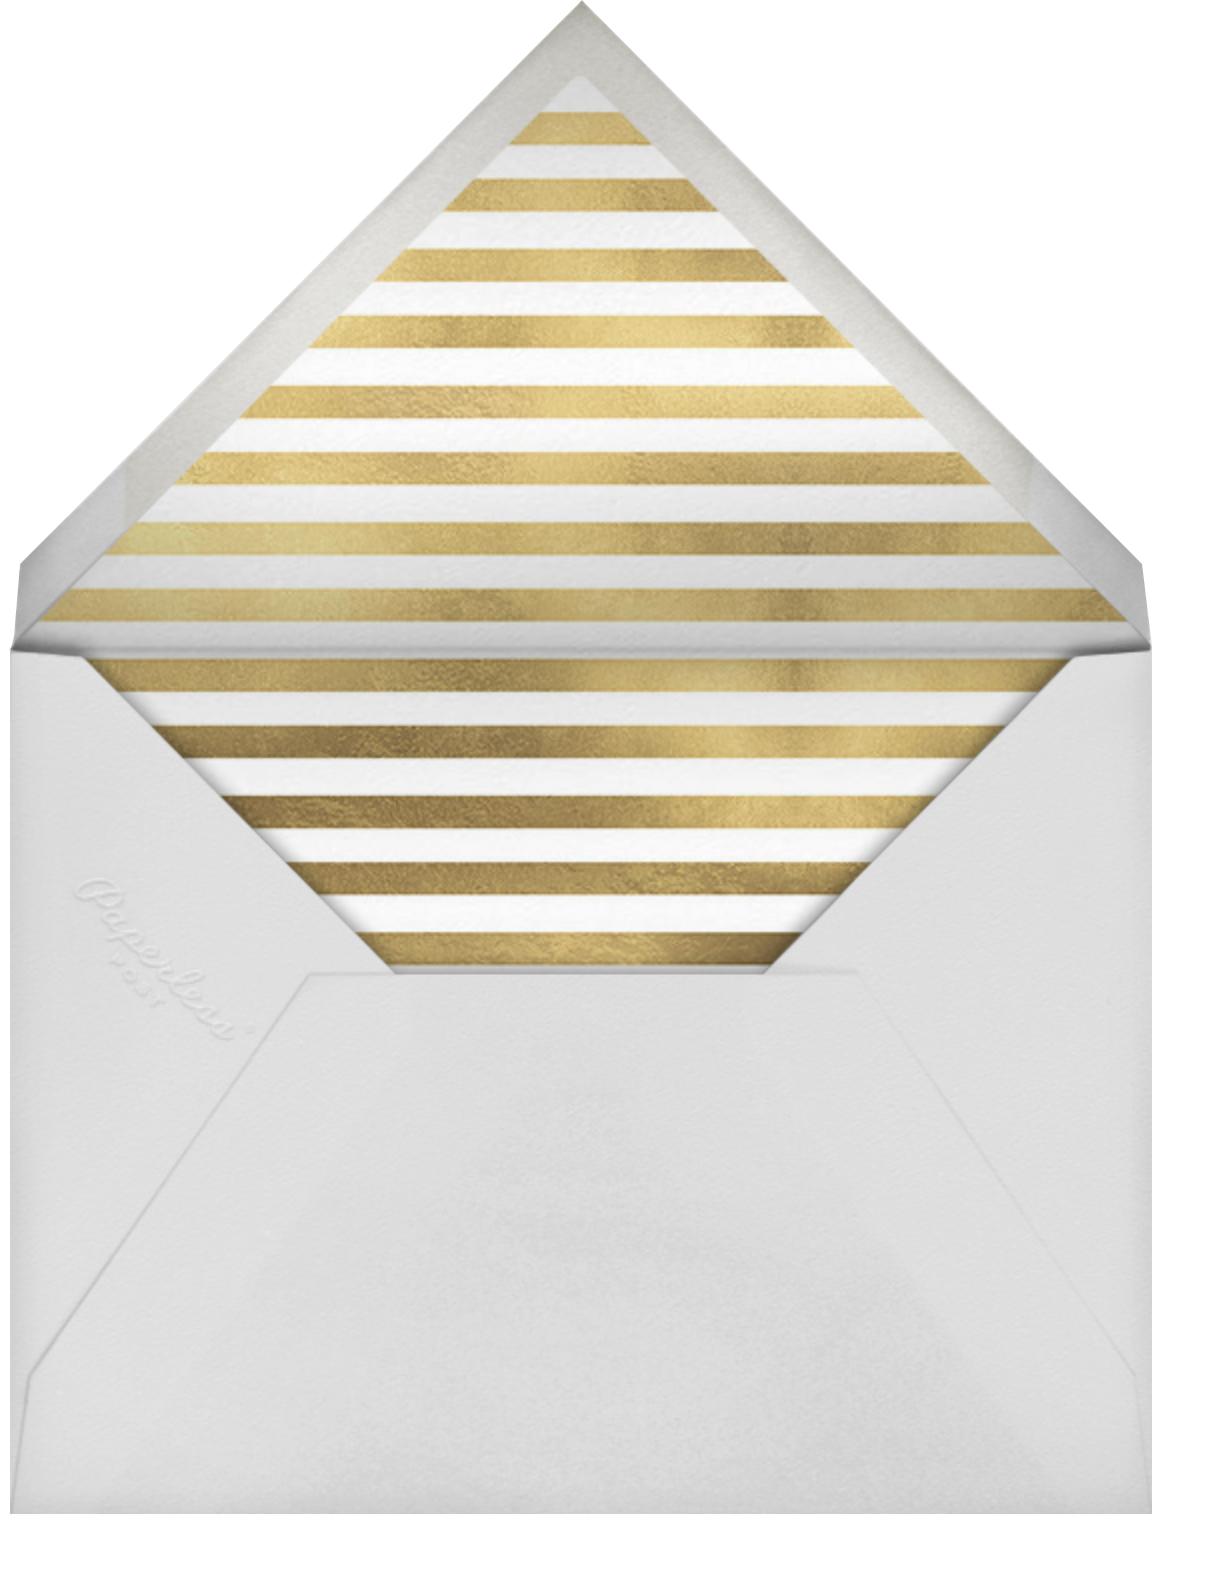 Dreidel - kate spade new york - Hanukkah - envelope back